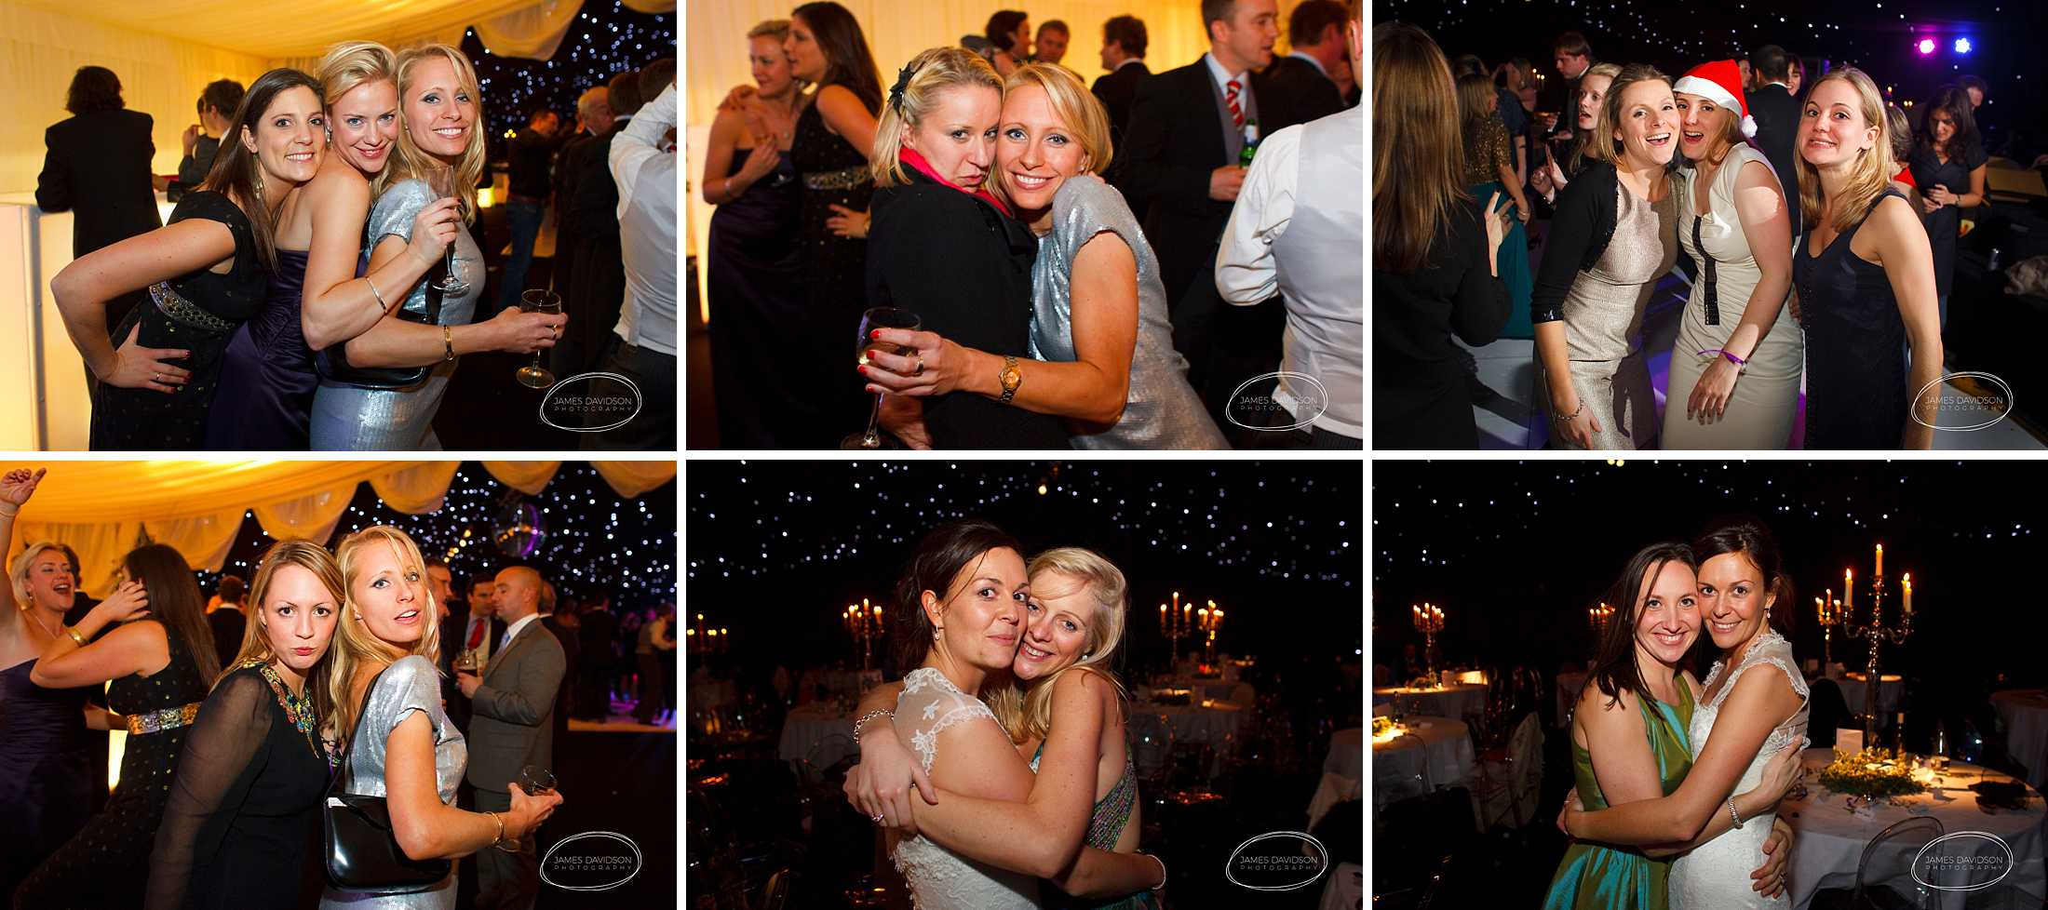 huddersfield-wedding-photography-064